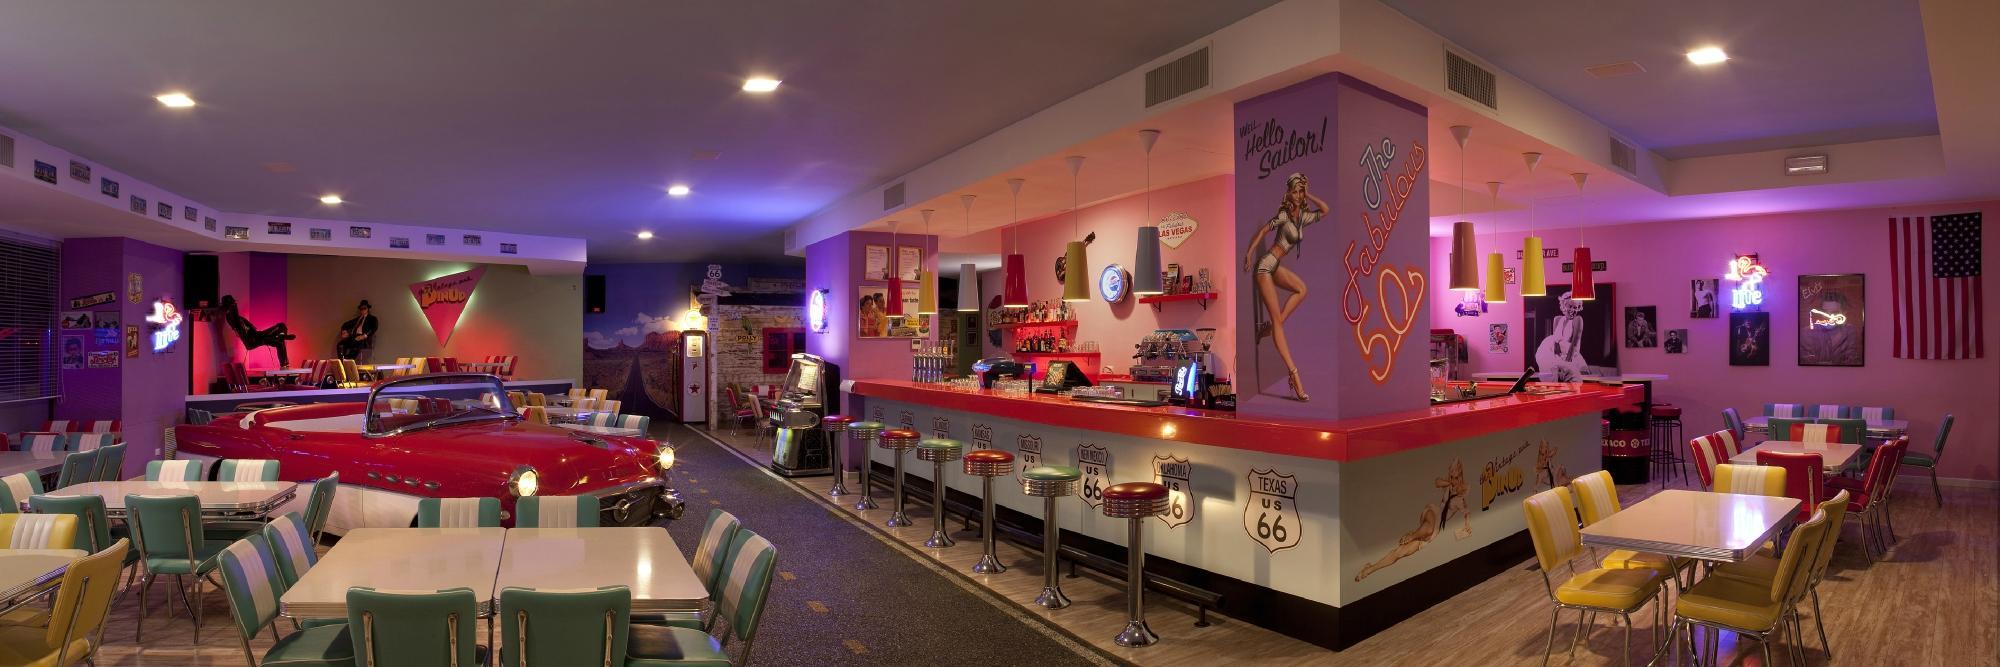 PinUp Pub, Volpago del Montello - Restaurant Reviews, Phone Number ...